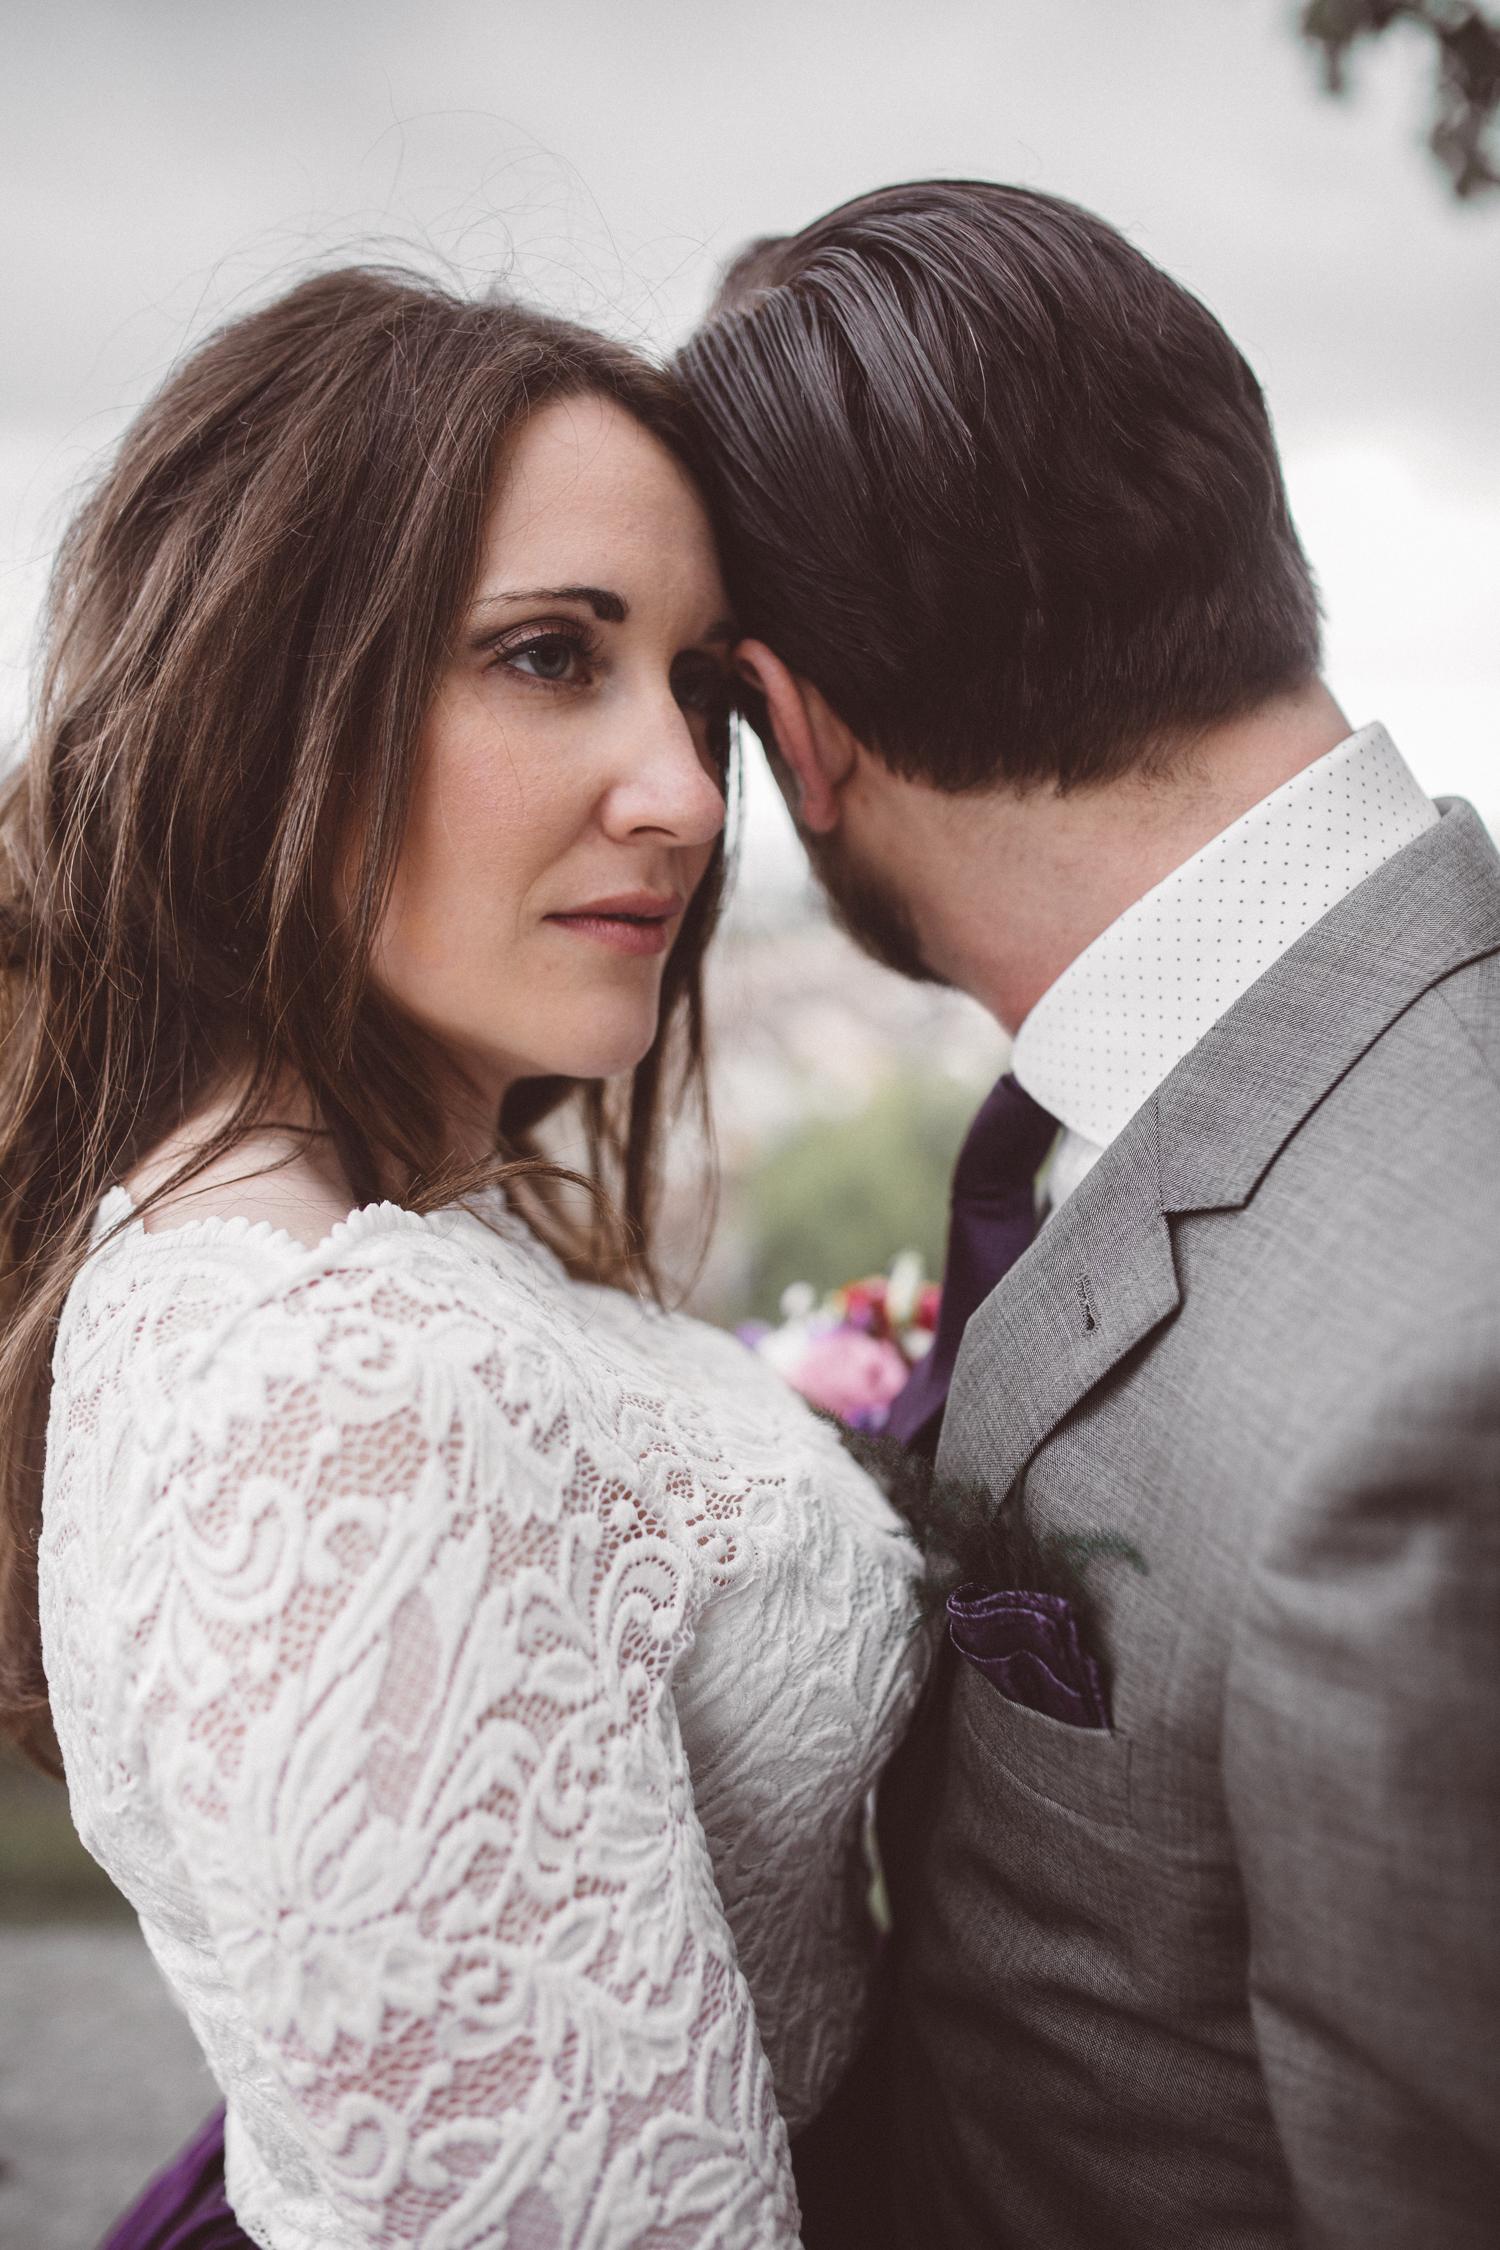 kdp_courtney&sean_wed_web-52.jpg